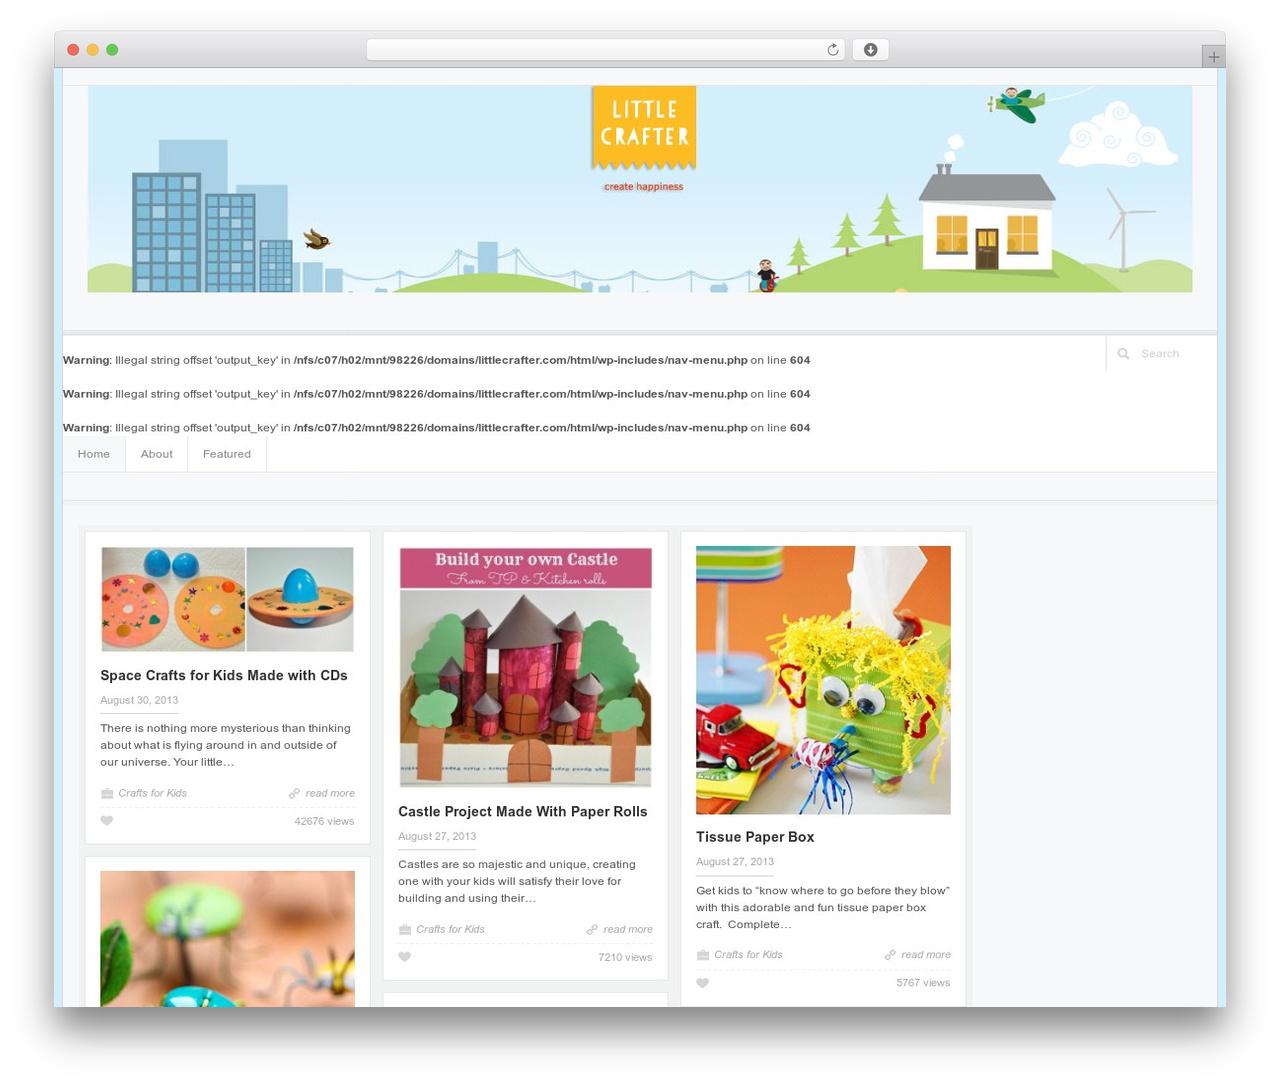 Accord - Responsive WordPress Blog Theme WordPress blog theme - littlecrafter.com